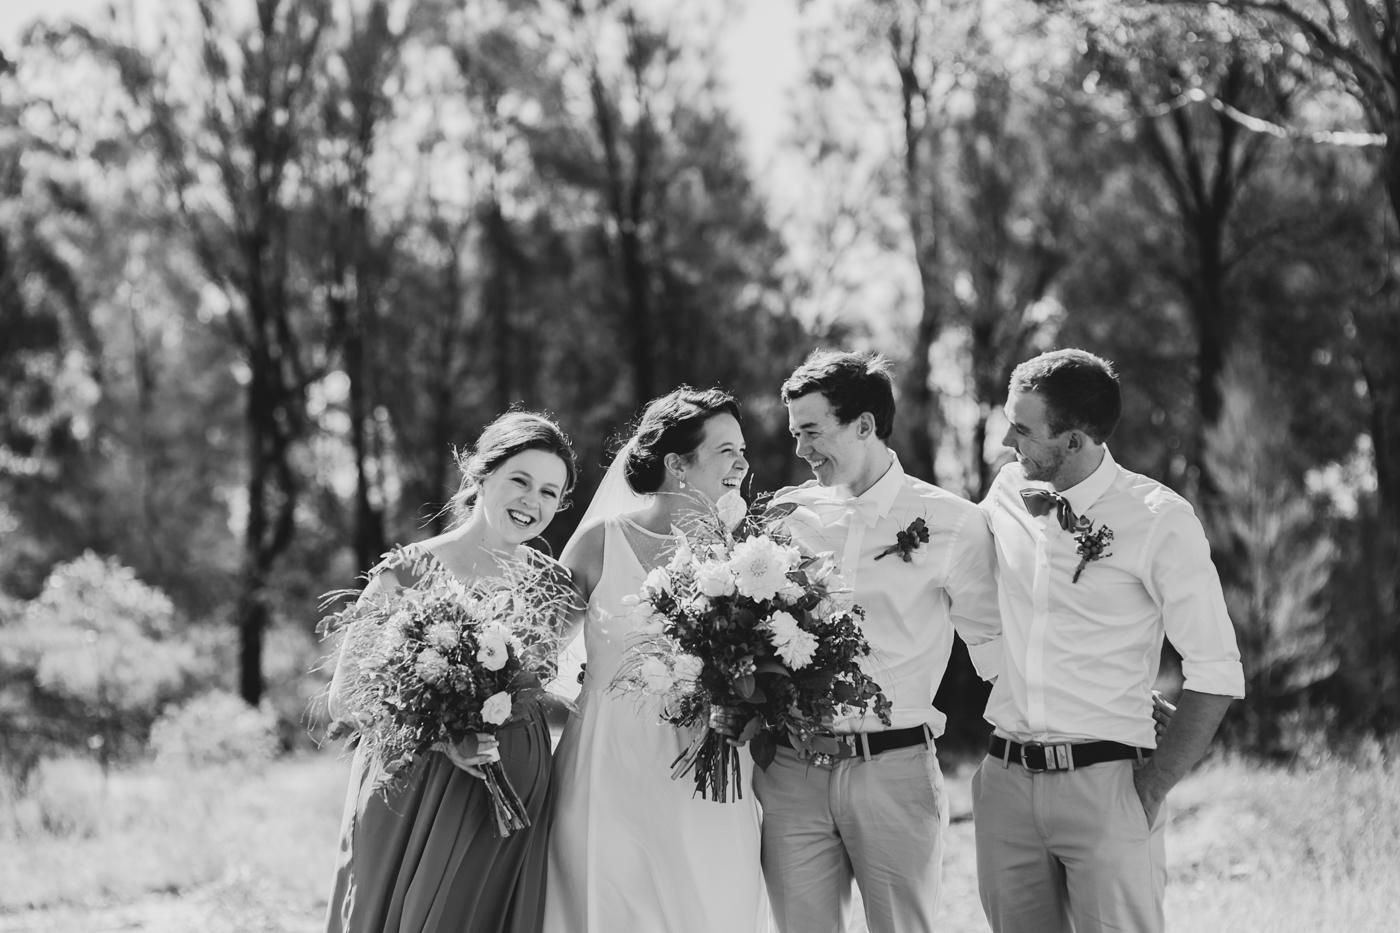 Nicolle & Jacob - Dubbo Wedding - Country Australia - Samantha Heather Photography-142.jpg